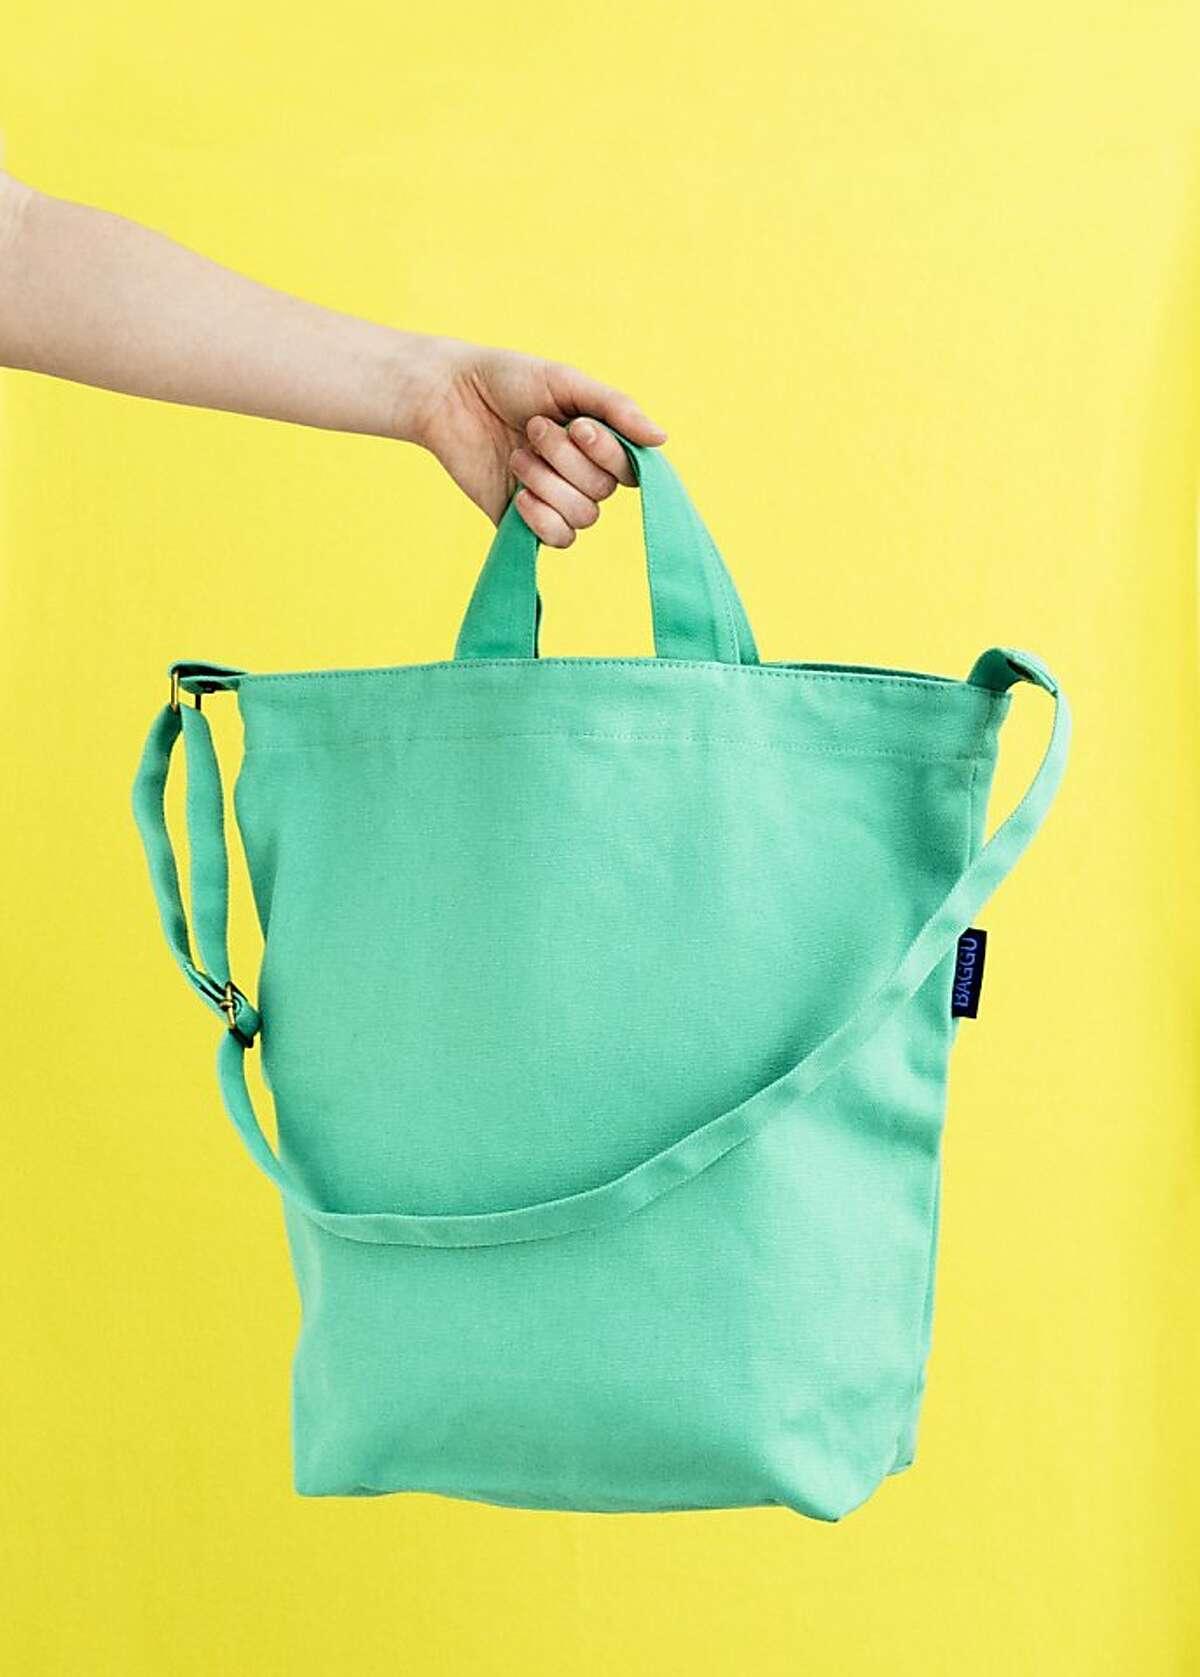 Less: $28 Canvas Duck Bag by Baggu